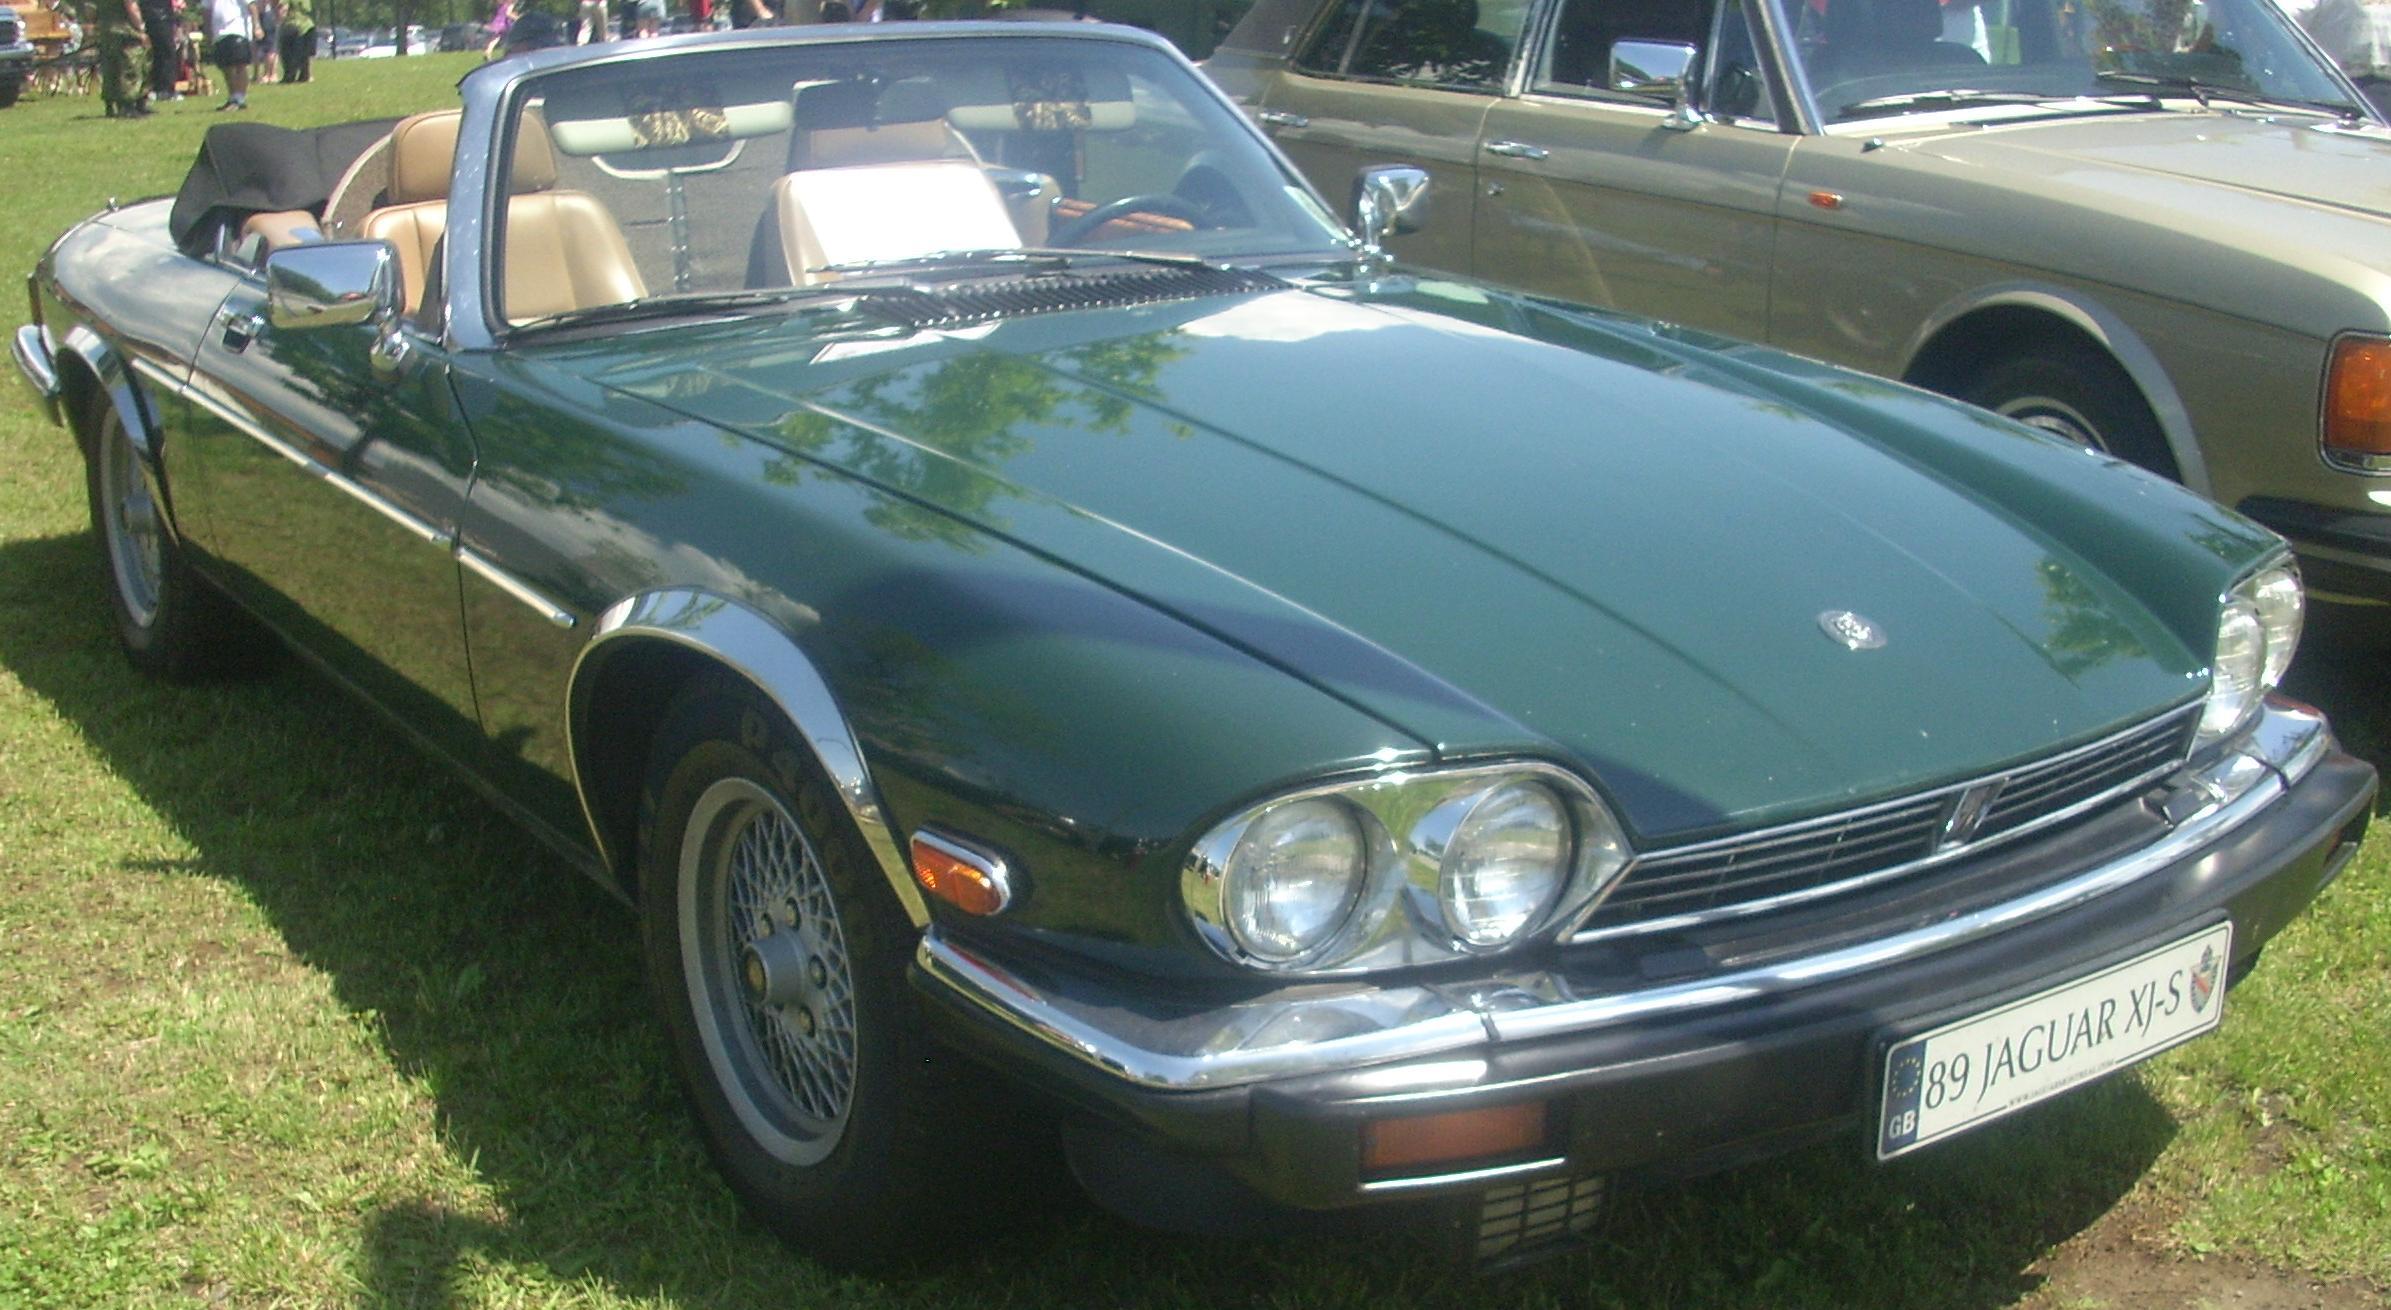 File:u002789 Jaguar XJS Convertible (Ste. Anne De Bellevue Veteranu0027s Hospital U0027